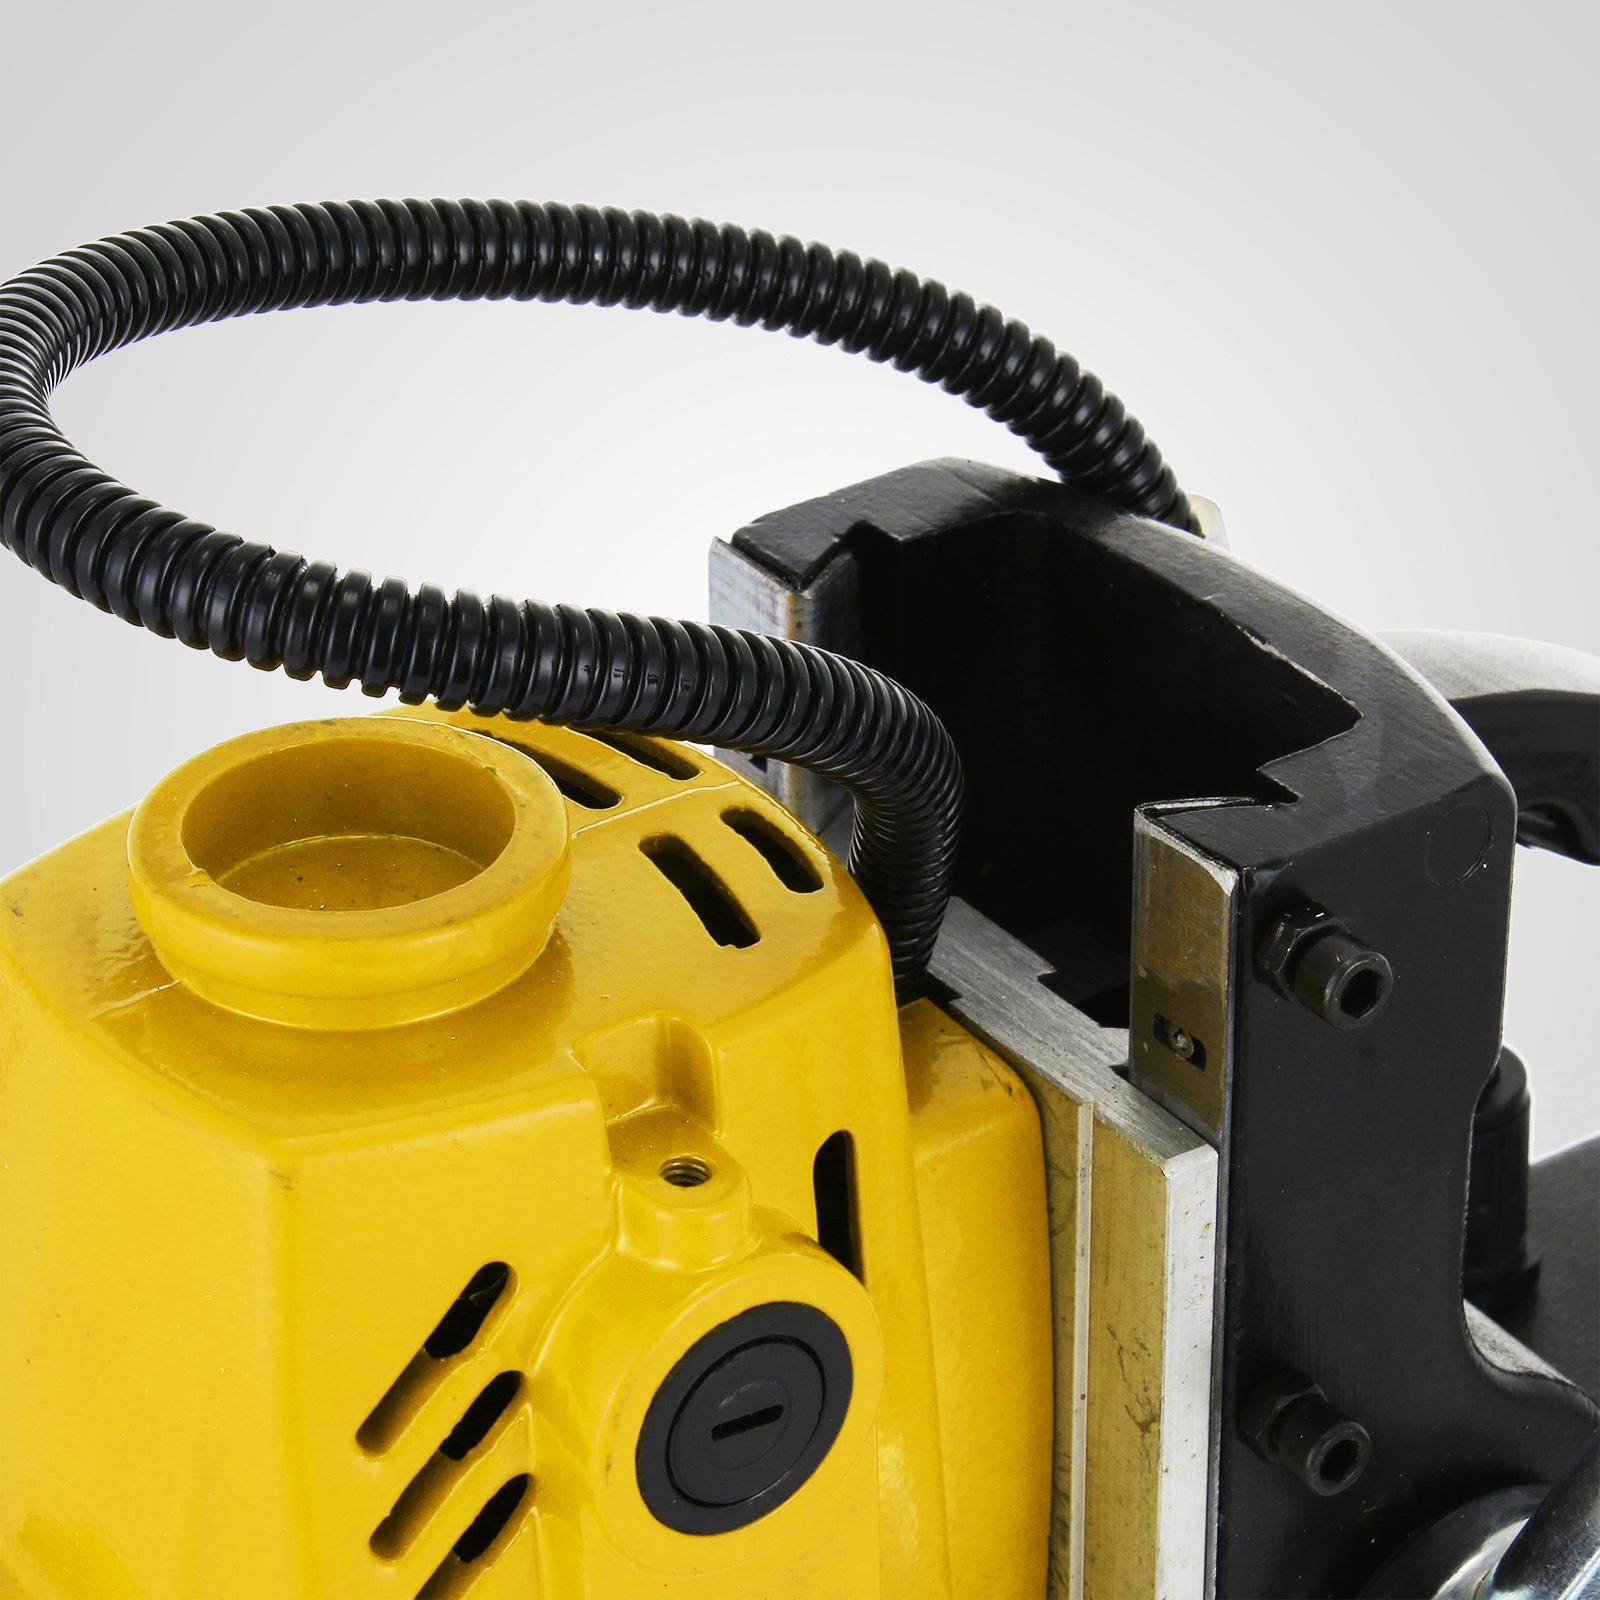 MB23-BRM35-MD40-Trapano-Perforatrice-Carotatore-Fresa-Magnetico-12-40mm-230V miniatura 20